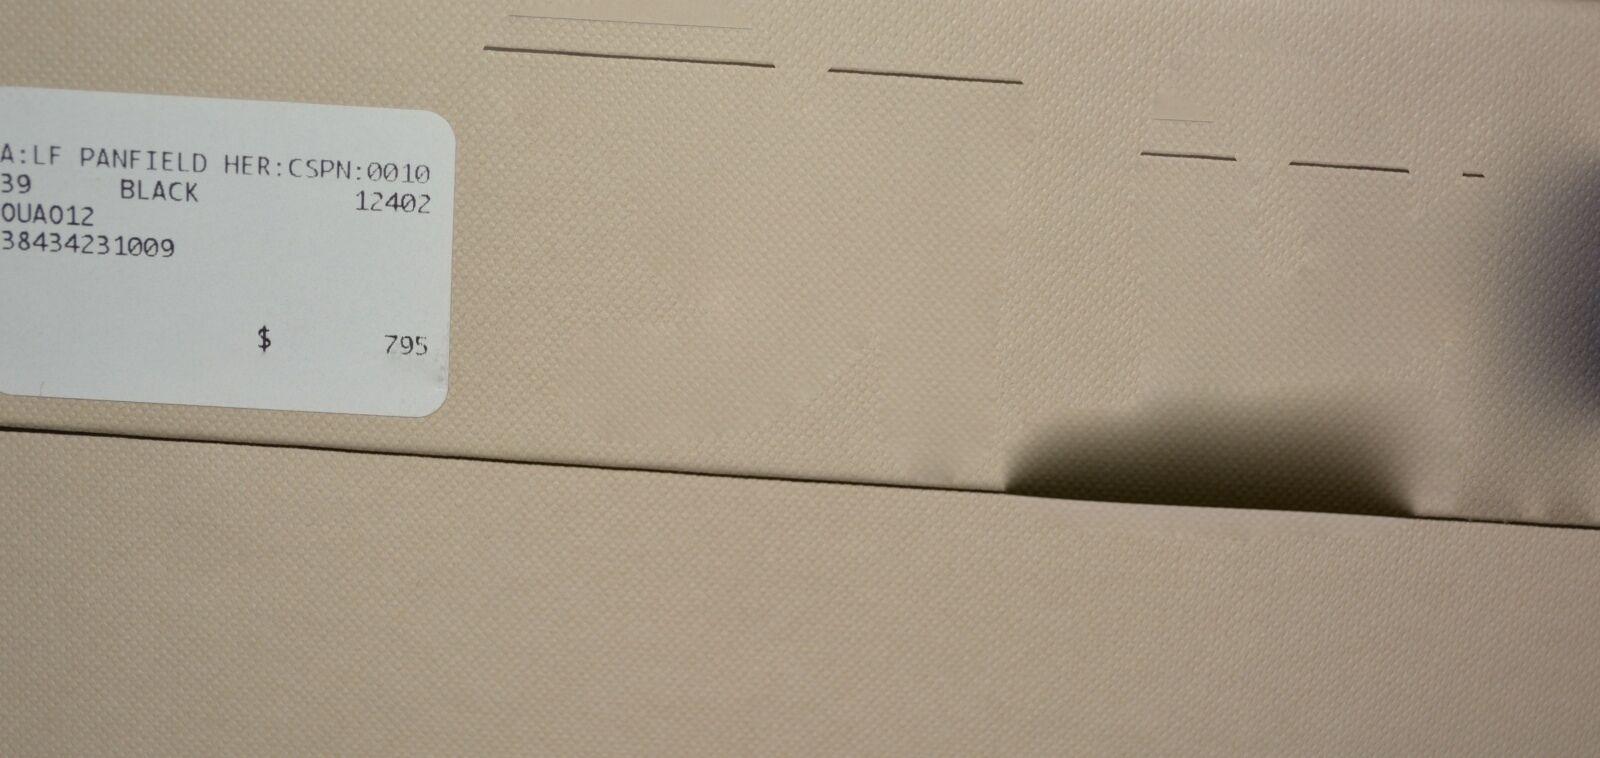 NIB BURBERRY PRORSUM ENGLISH Stiefel HERITAGE PANFIELD SUEDE ANKLE Stiefel ENGLISH SZ US 9 EU 39 b89380